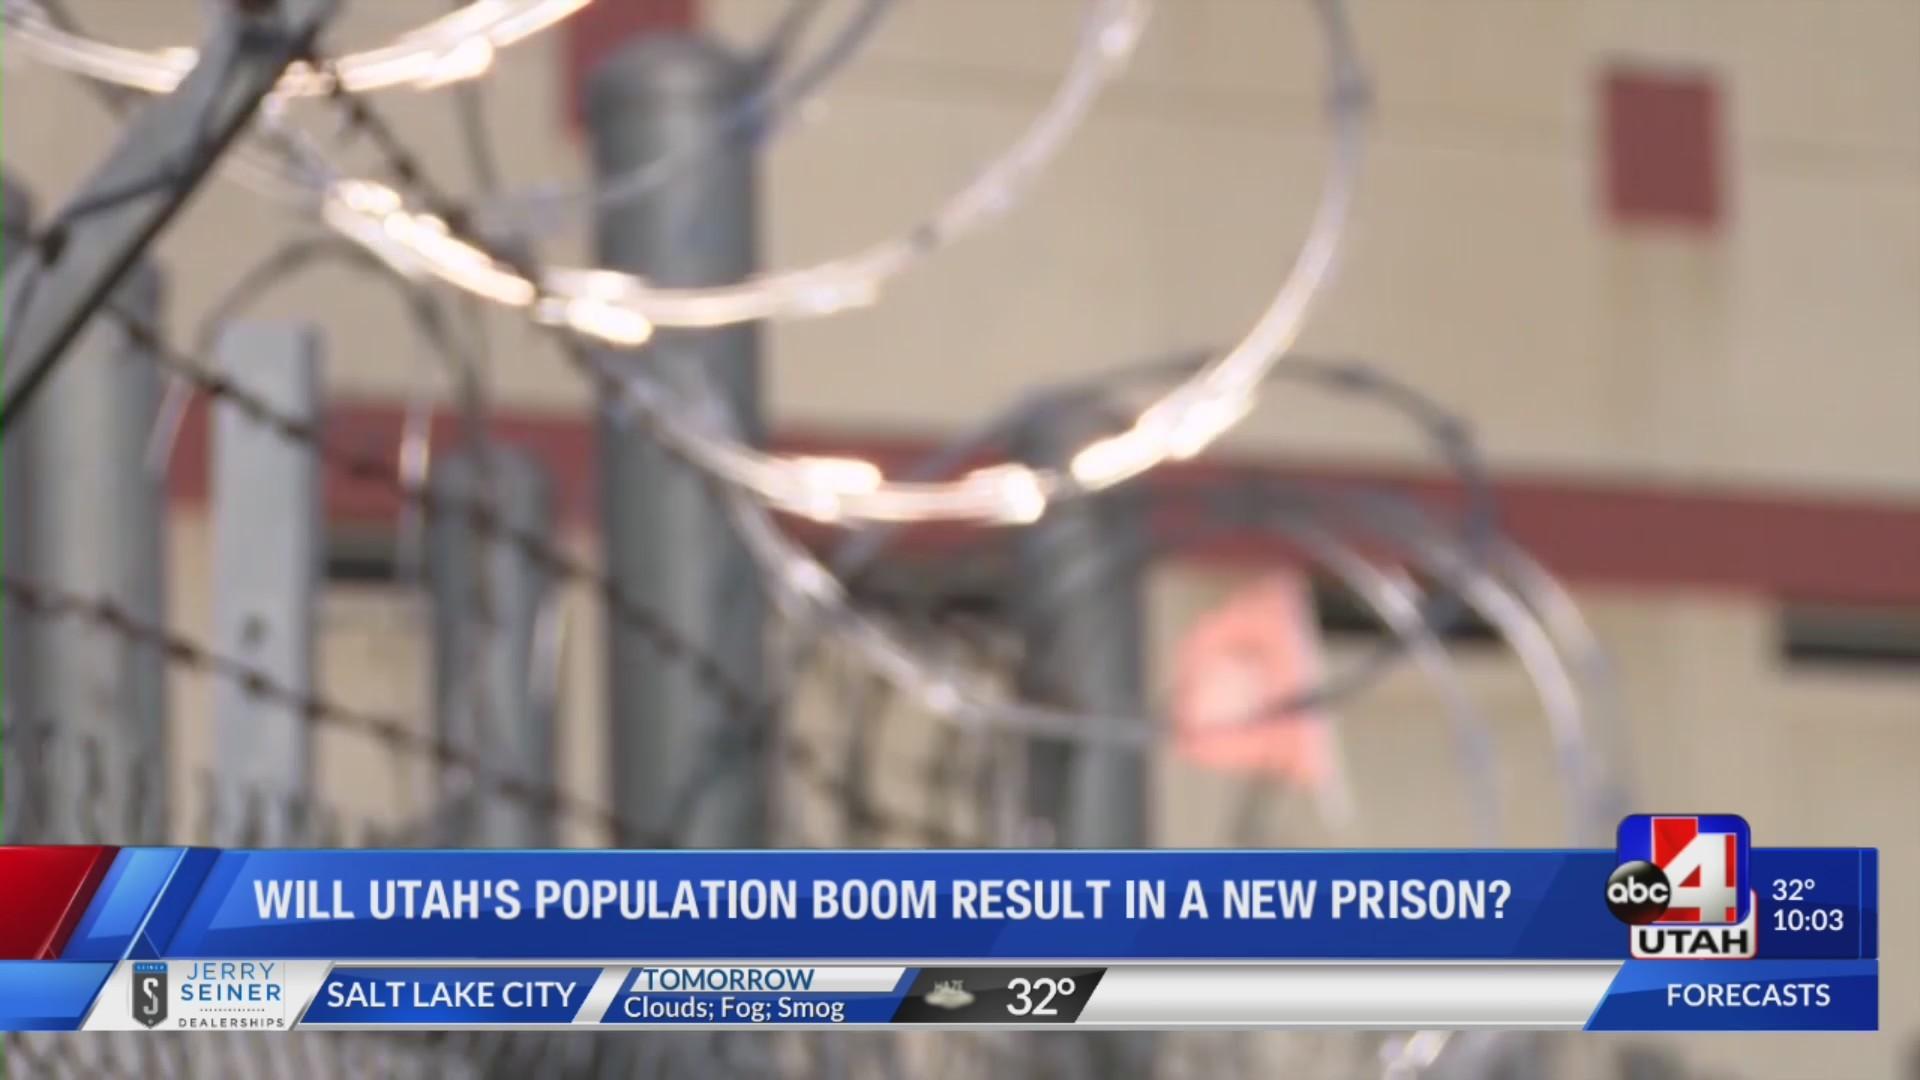 Will Utah's population boom result in new prison?